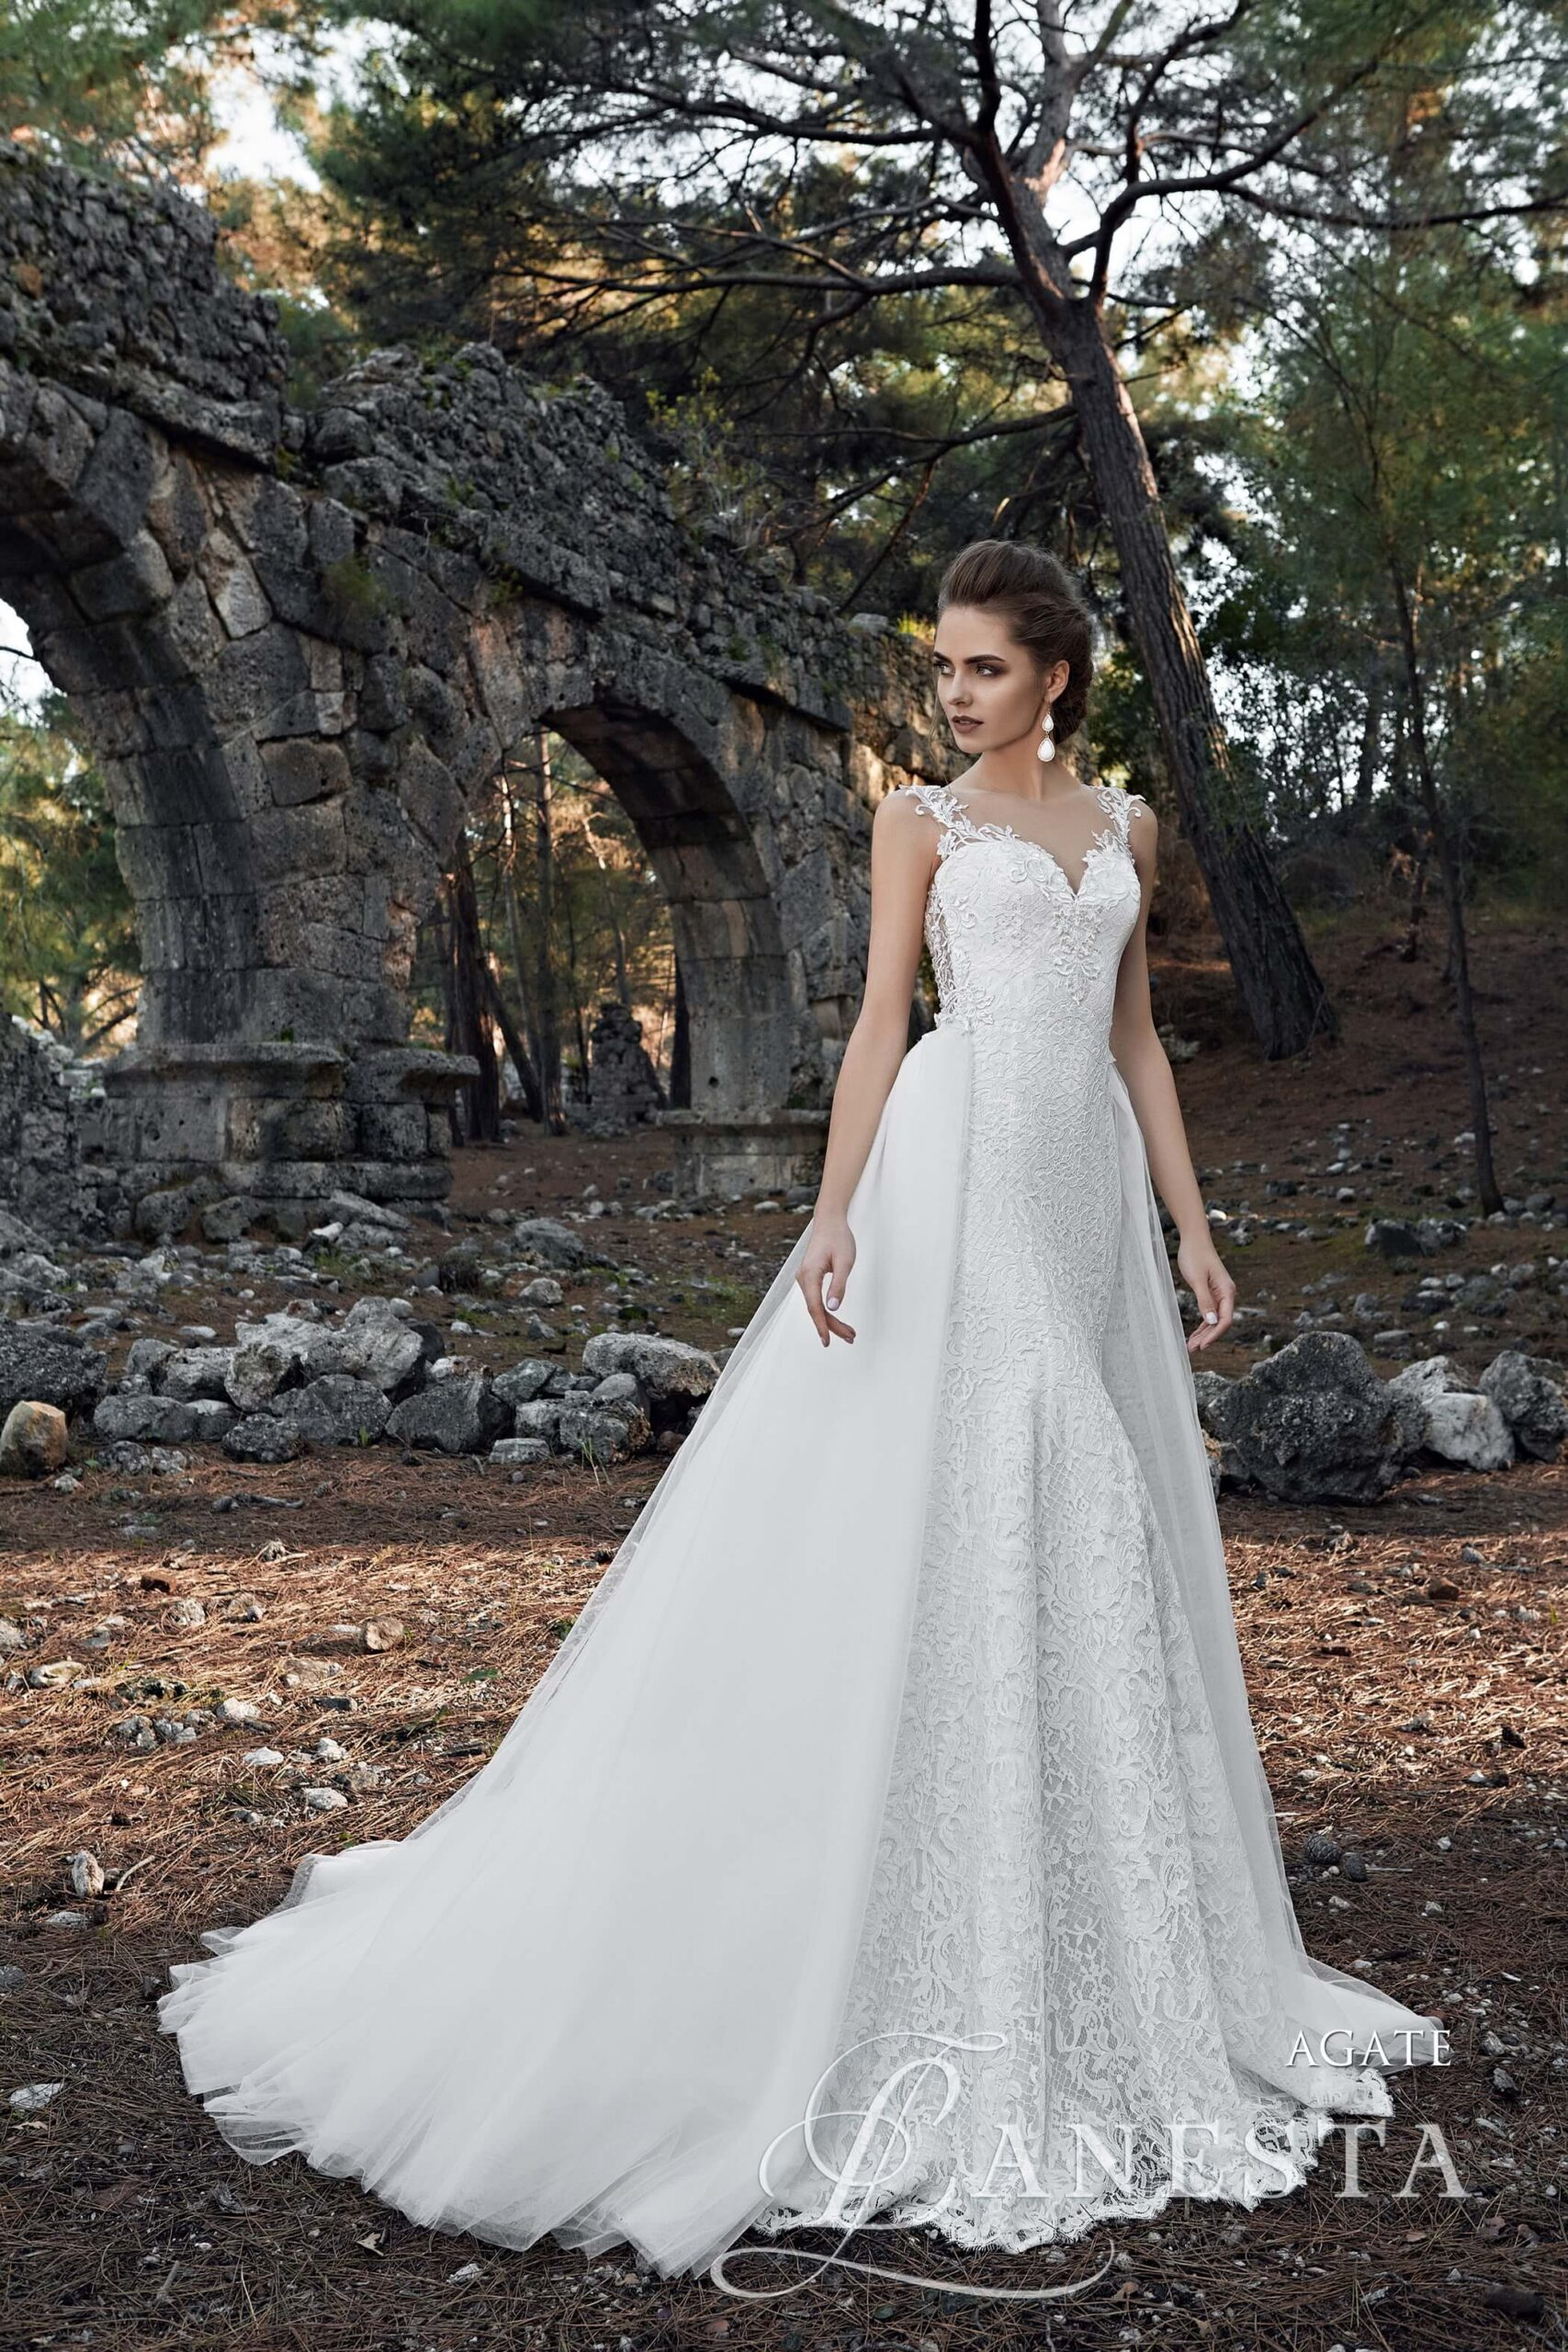 Весільна сукня Agate Lanesta